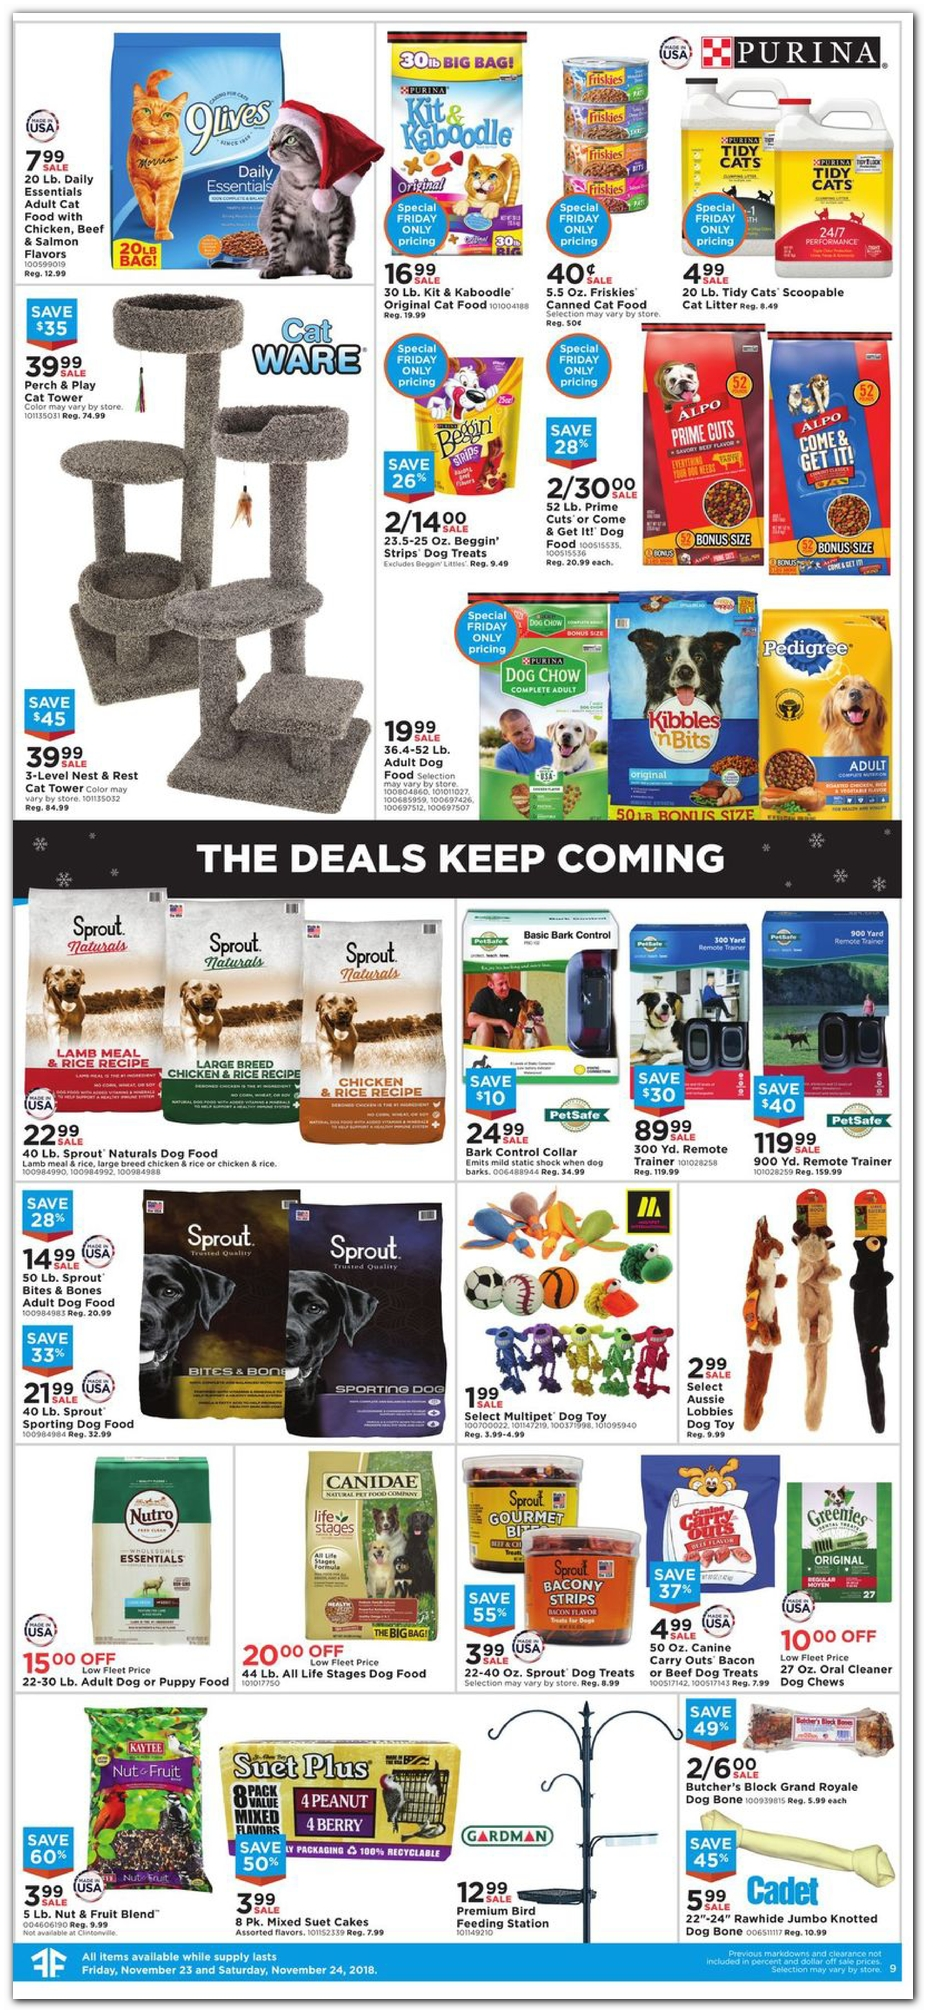 Mills Fleet Farm Promo Code >> Farm Fleet Black Friday Ad Sale Deals Doorbusters 2018